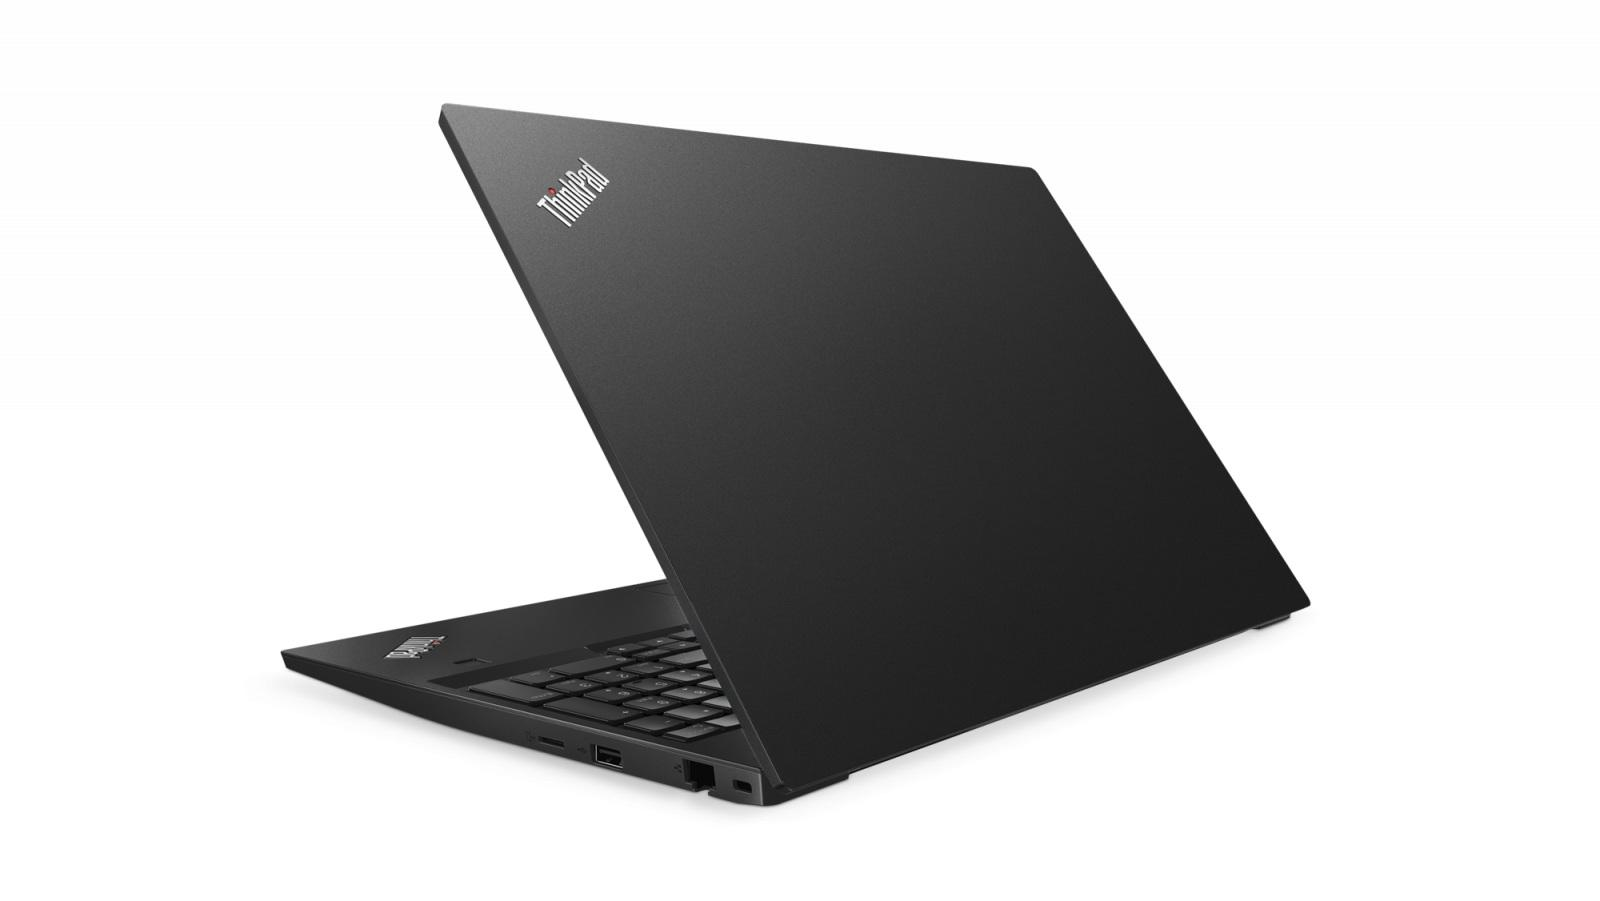 Фото3  Ноутбук ThinkPad E580 (20KS004GRT)